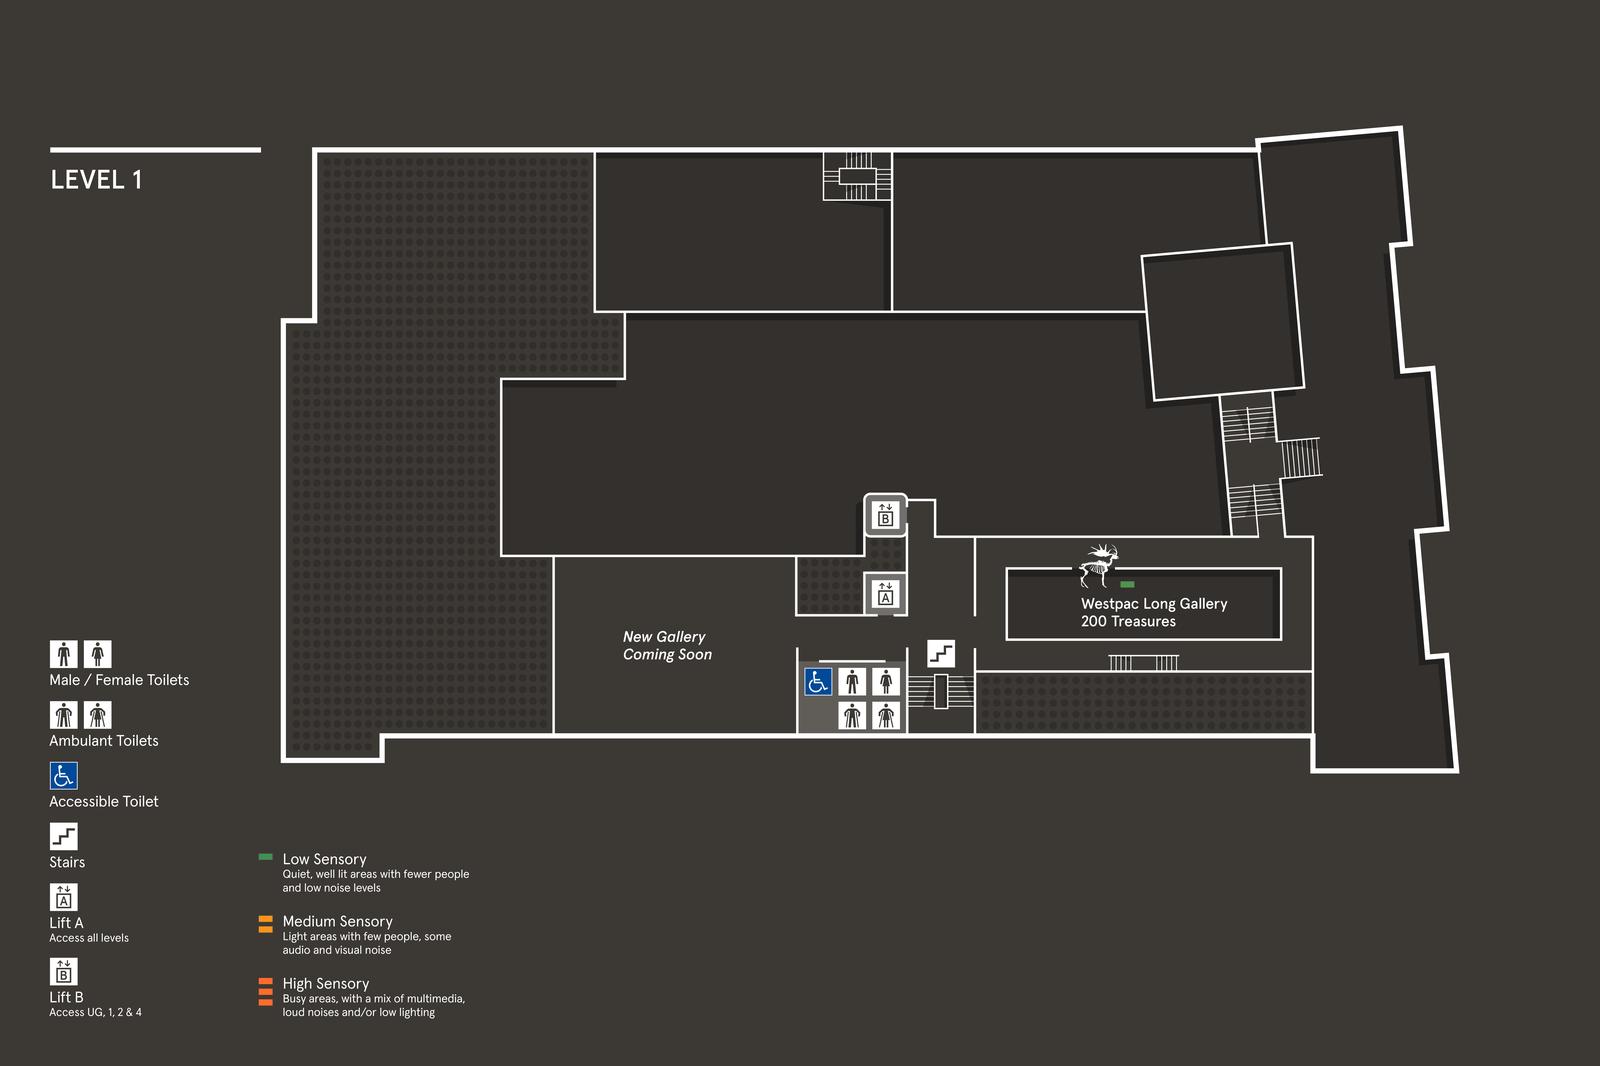 AM Map - Level 1